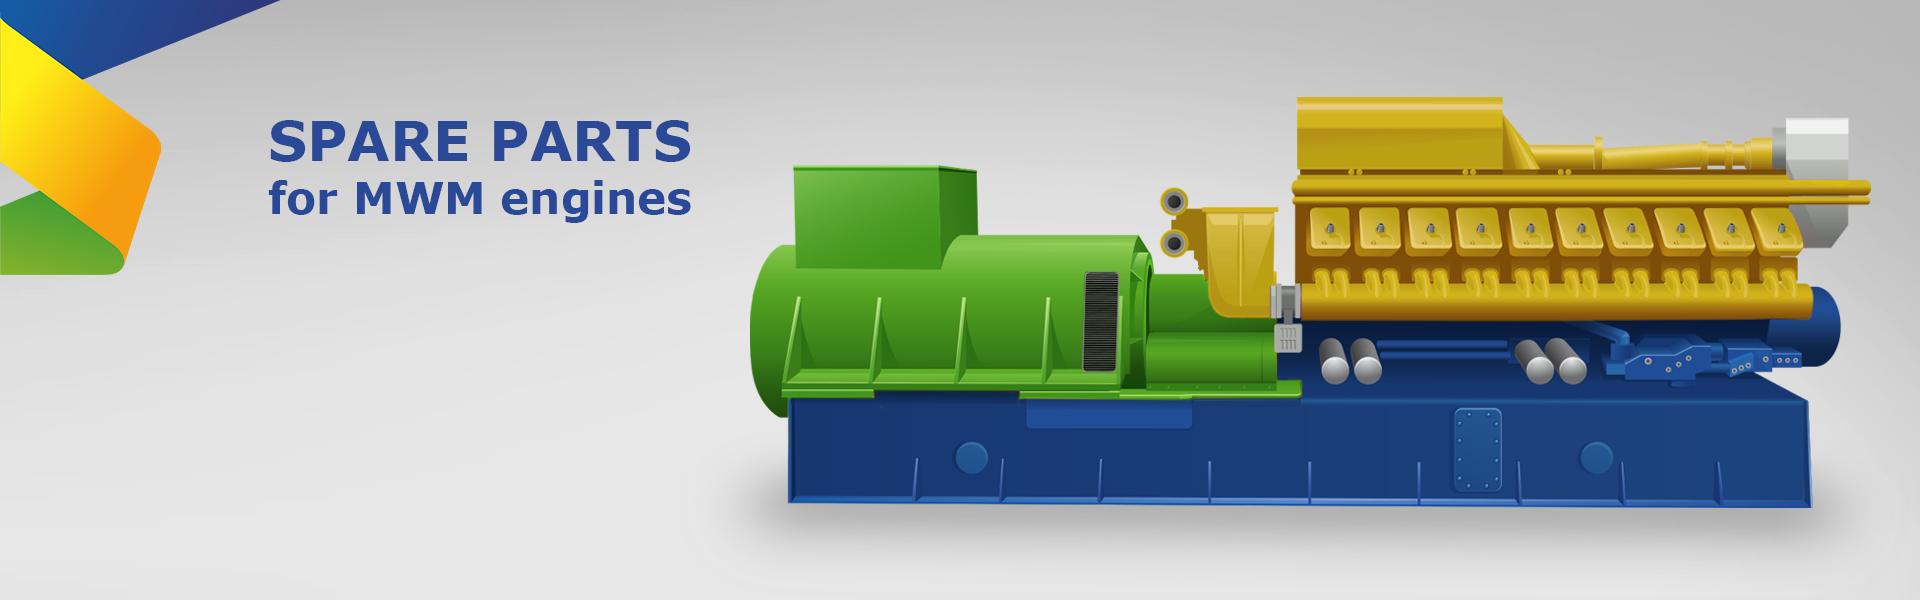 CHP spare parts MWM | EnginePartsOnline | Enspaer